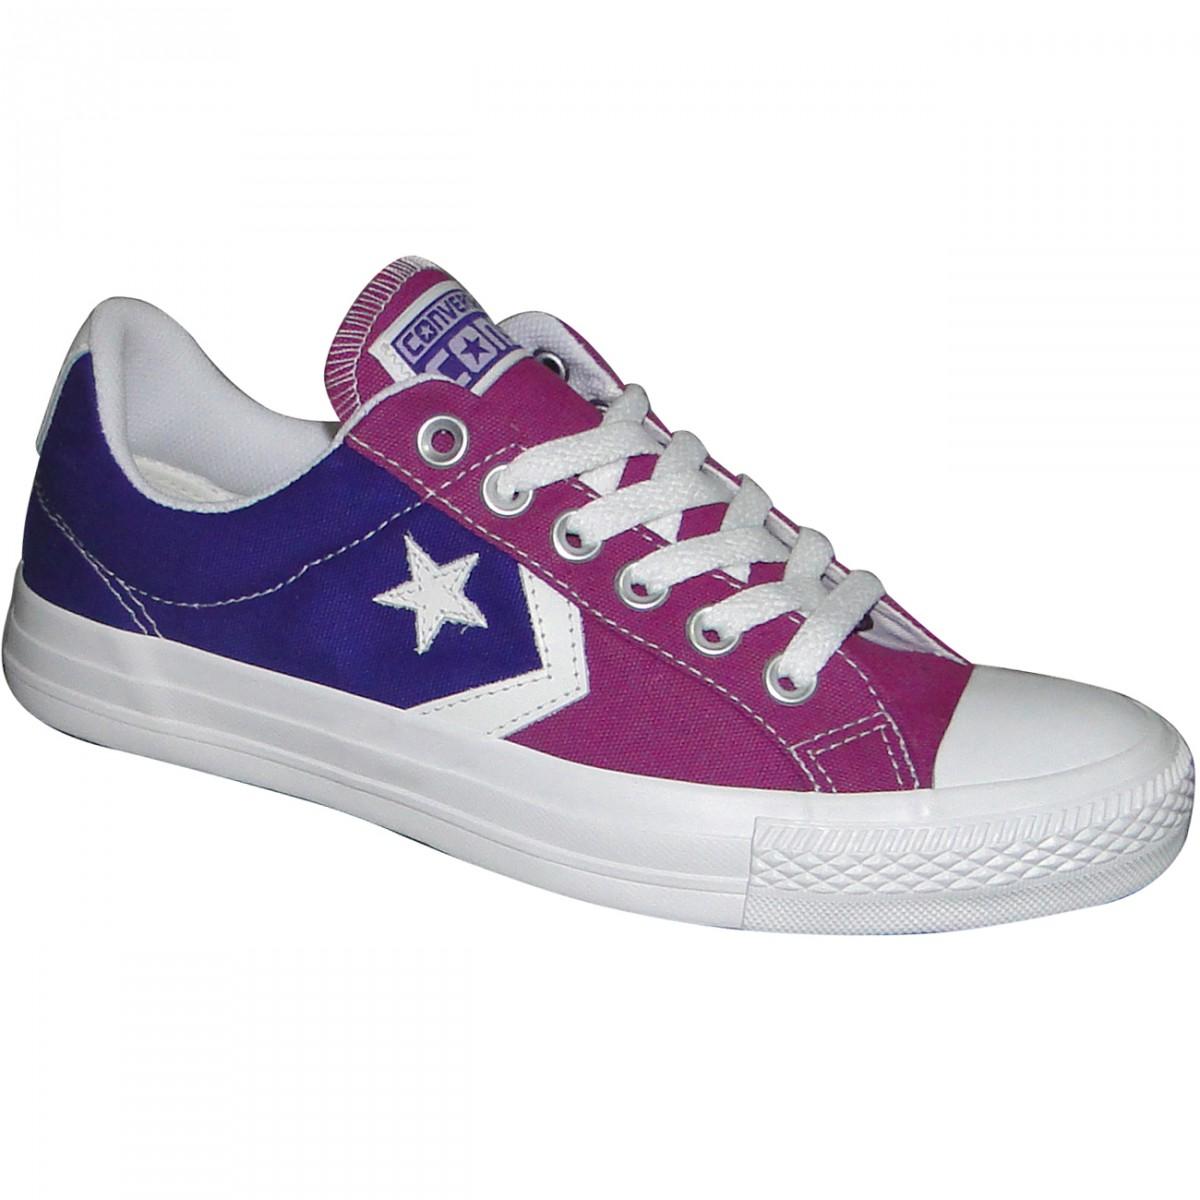 3f37903b3a2 Tenis All Star Converse Star Player CO261655 - Roxo Orquidea Branco - Chuteira  Nike